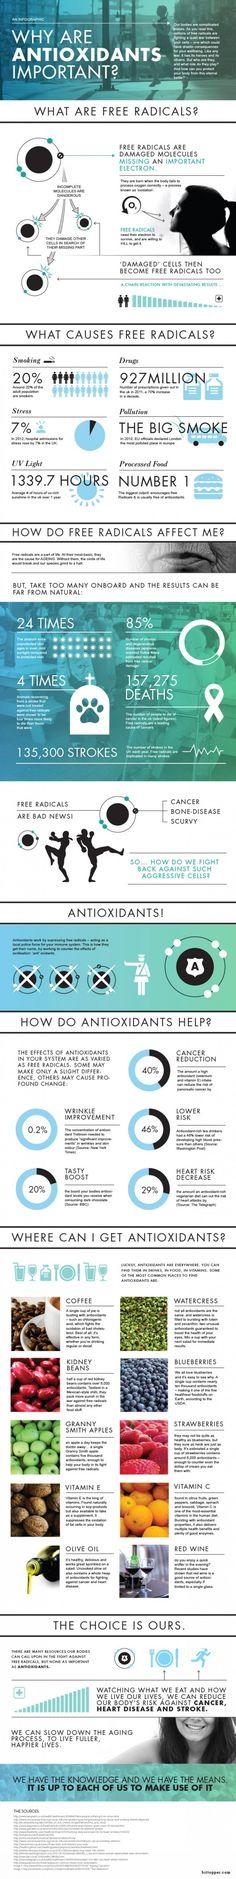 Are Antioxidants Important? via www.bittopper.com/post.php?id=745897179532db30b5789f2.61928814